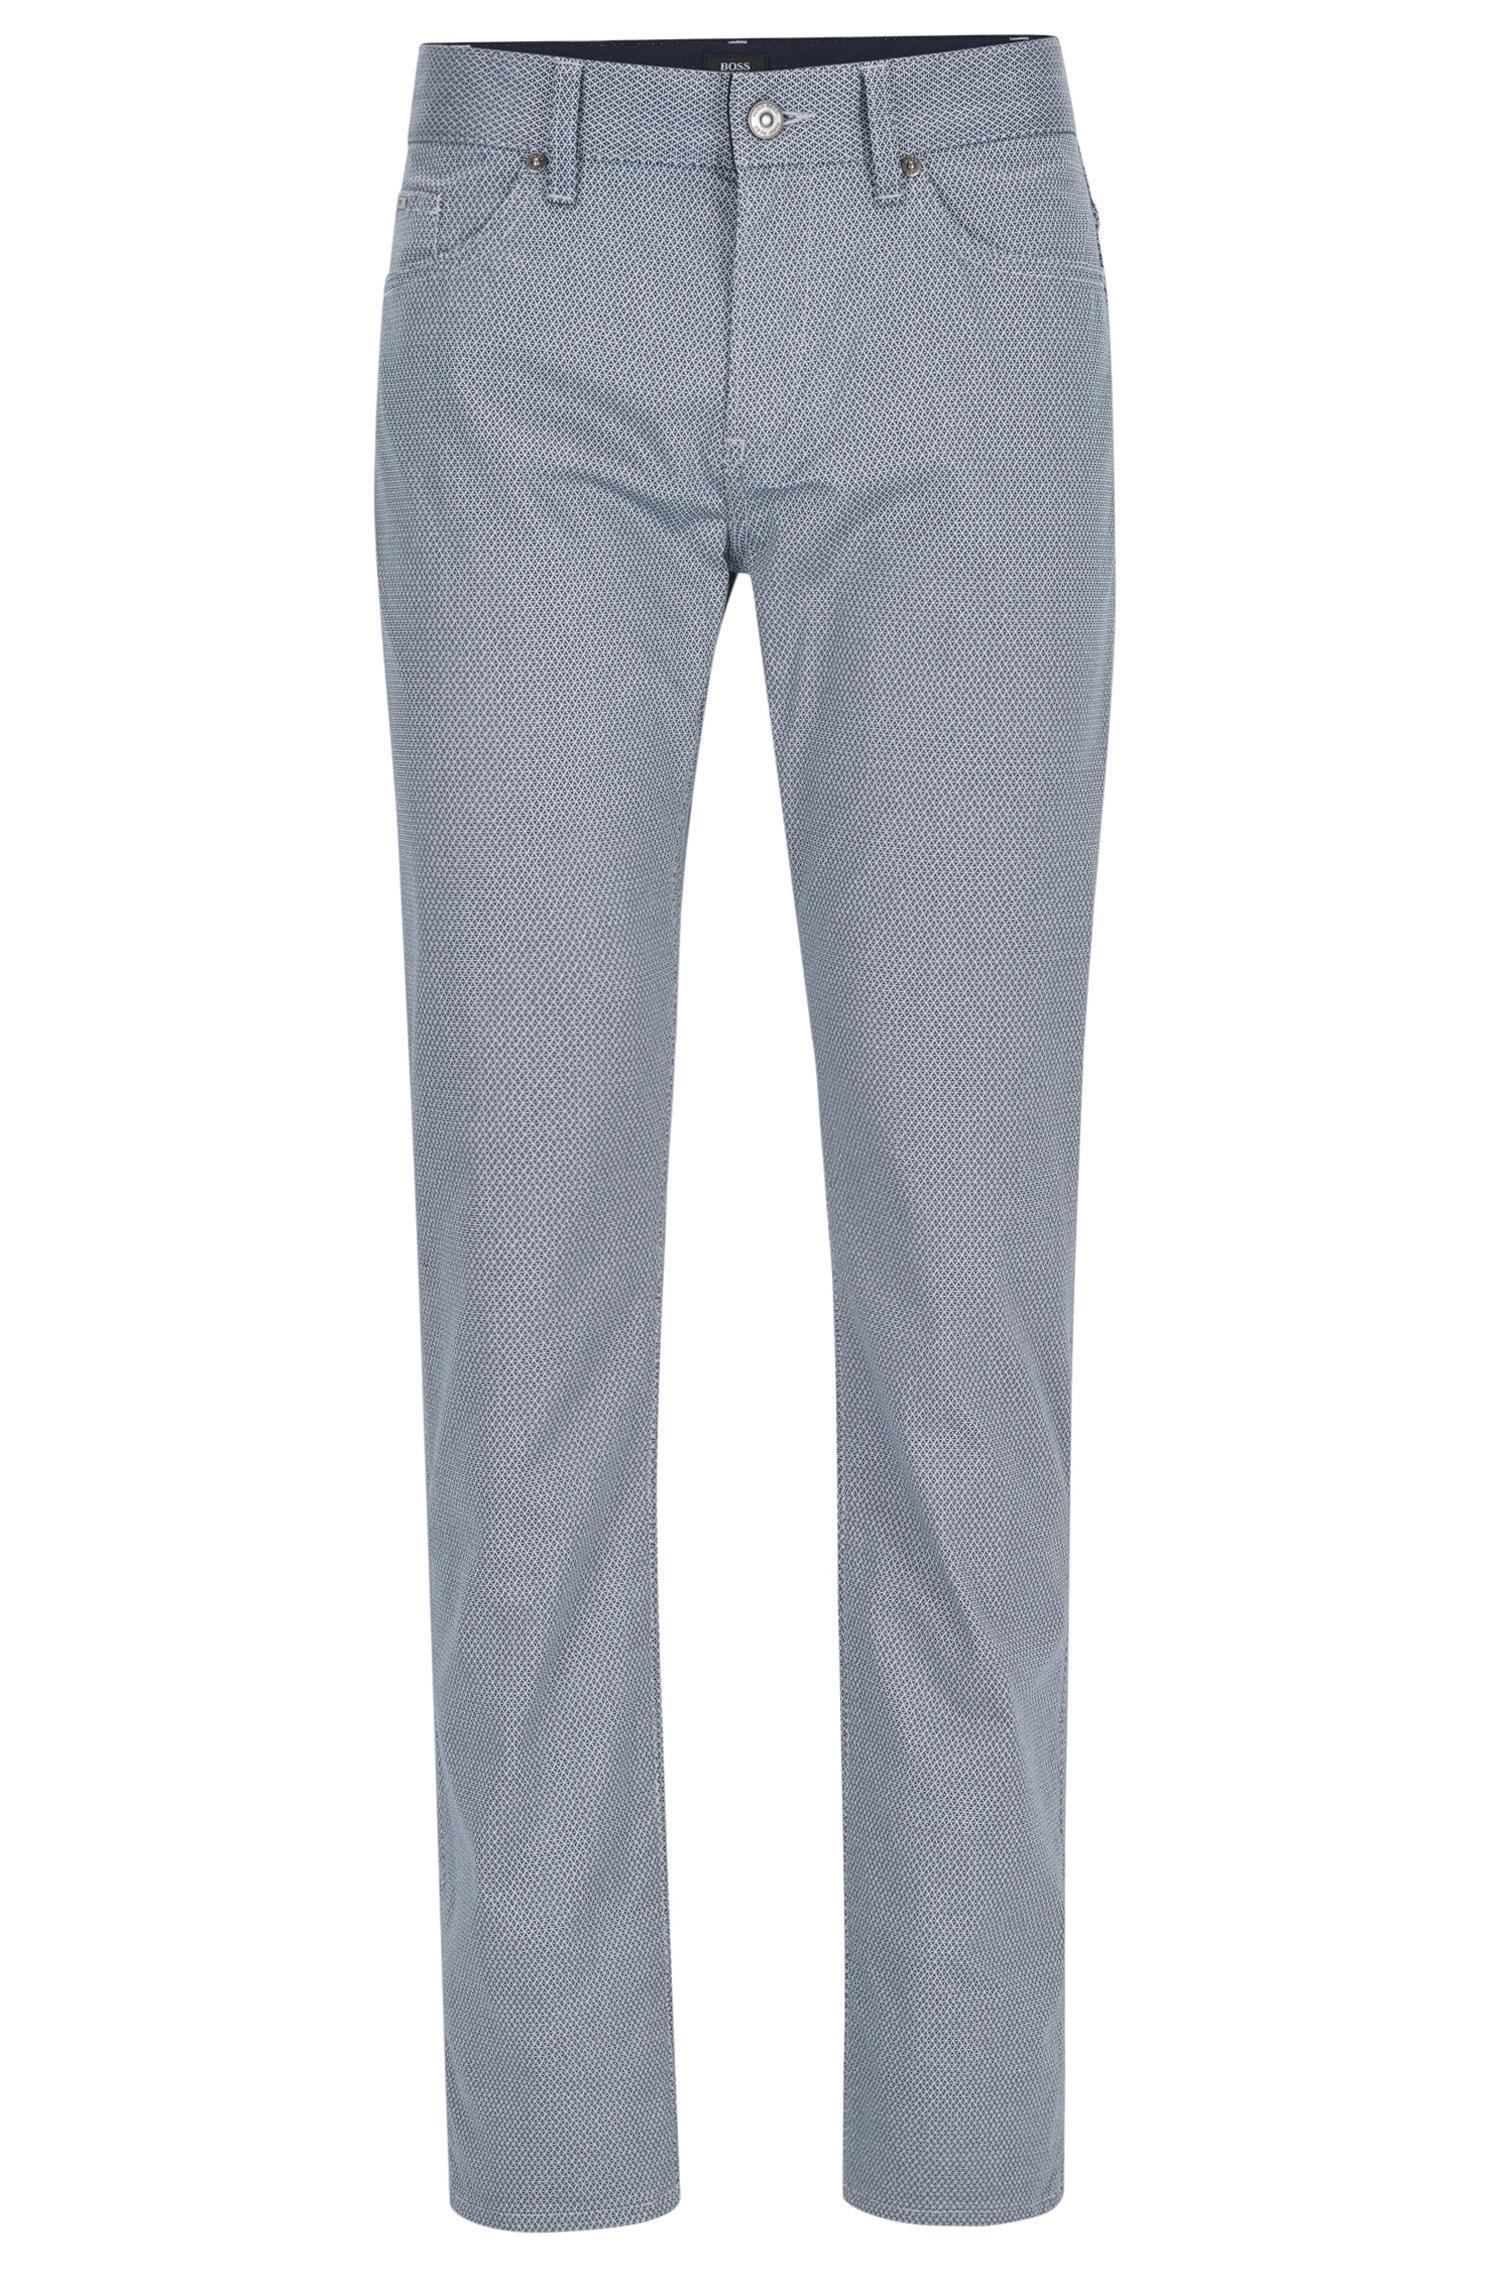 Jeans Regular Fit En Patron Coton Stretch Chiné kr3LoRjpmW